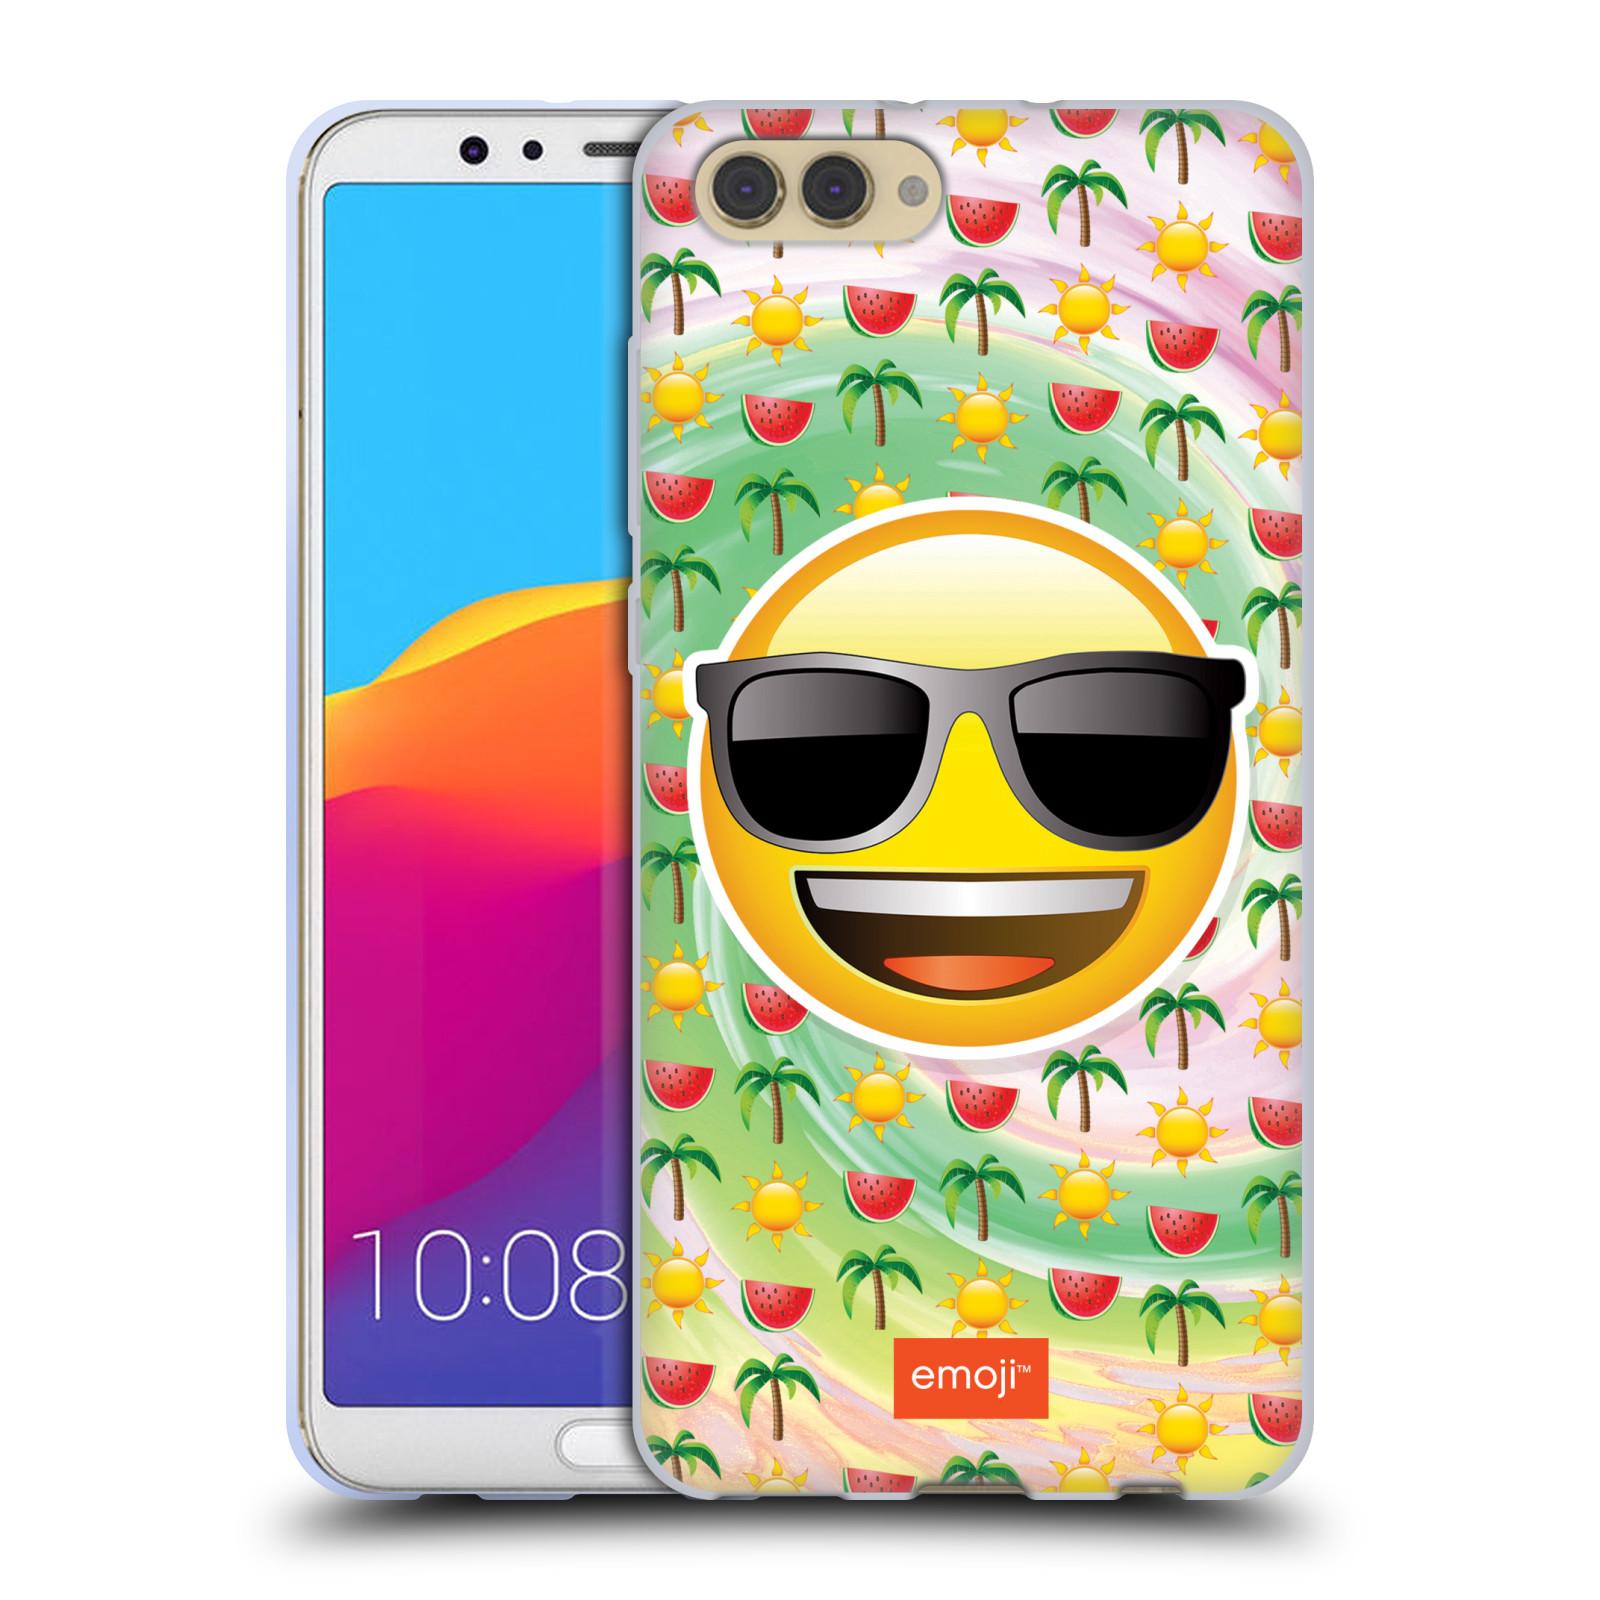 HEAD CASE silikonový obal na mobil Huawei HONOR VIEW 10 / V10 smajlík oficiální kryt EMOJI velký smajlík léto